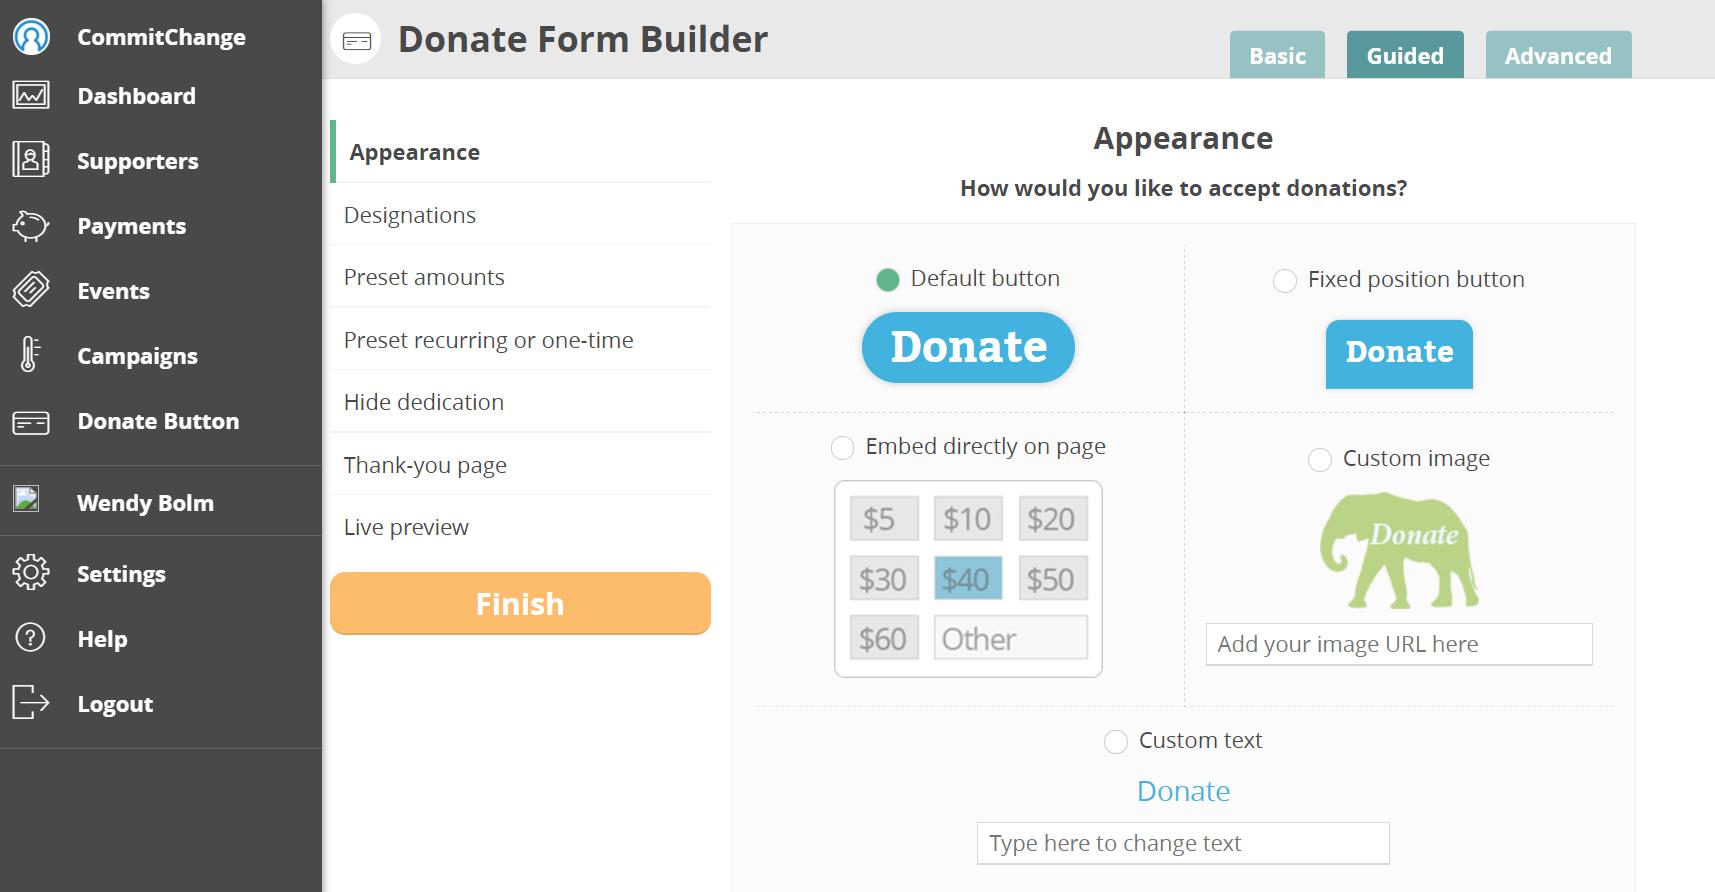 CommitChange Donate Button Builder